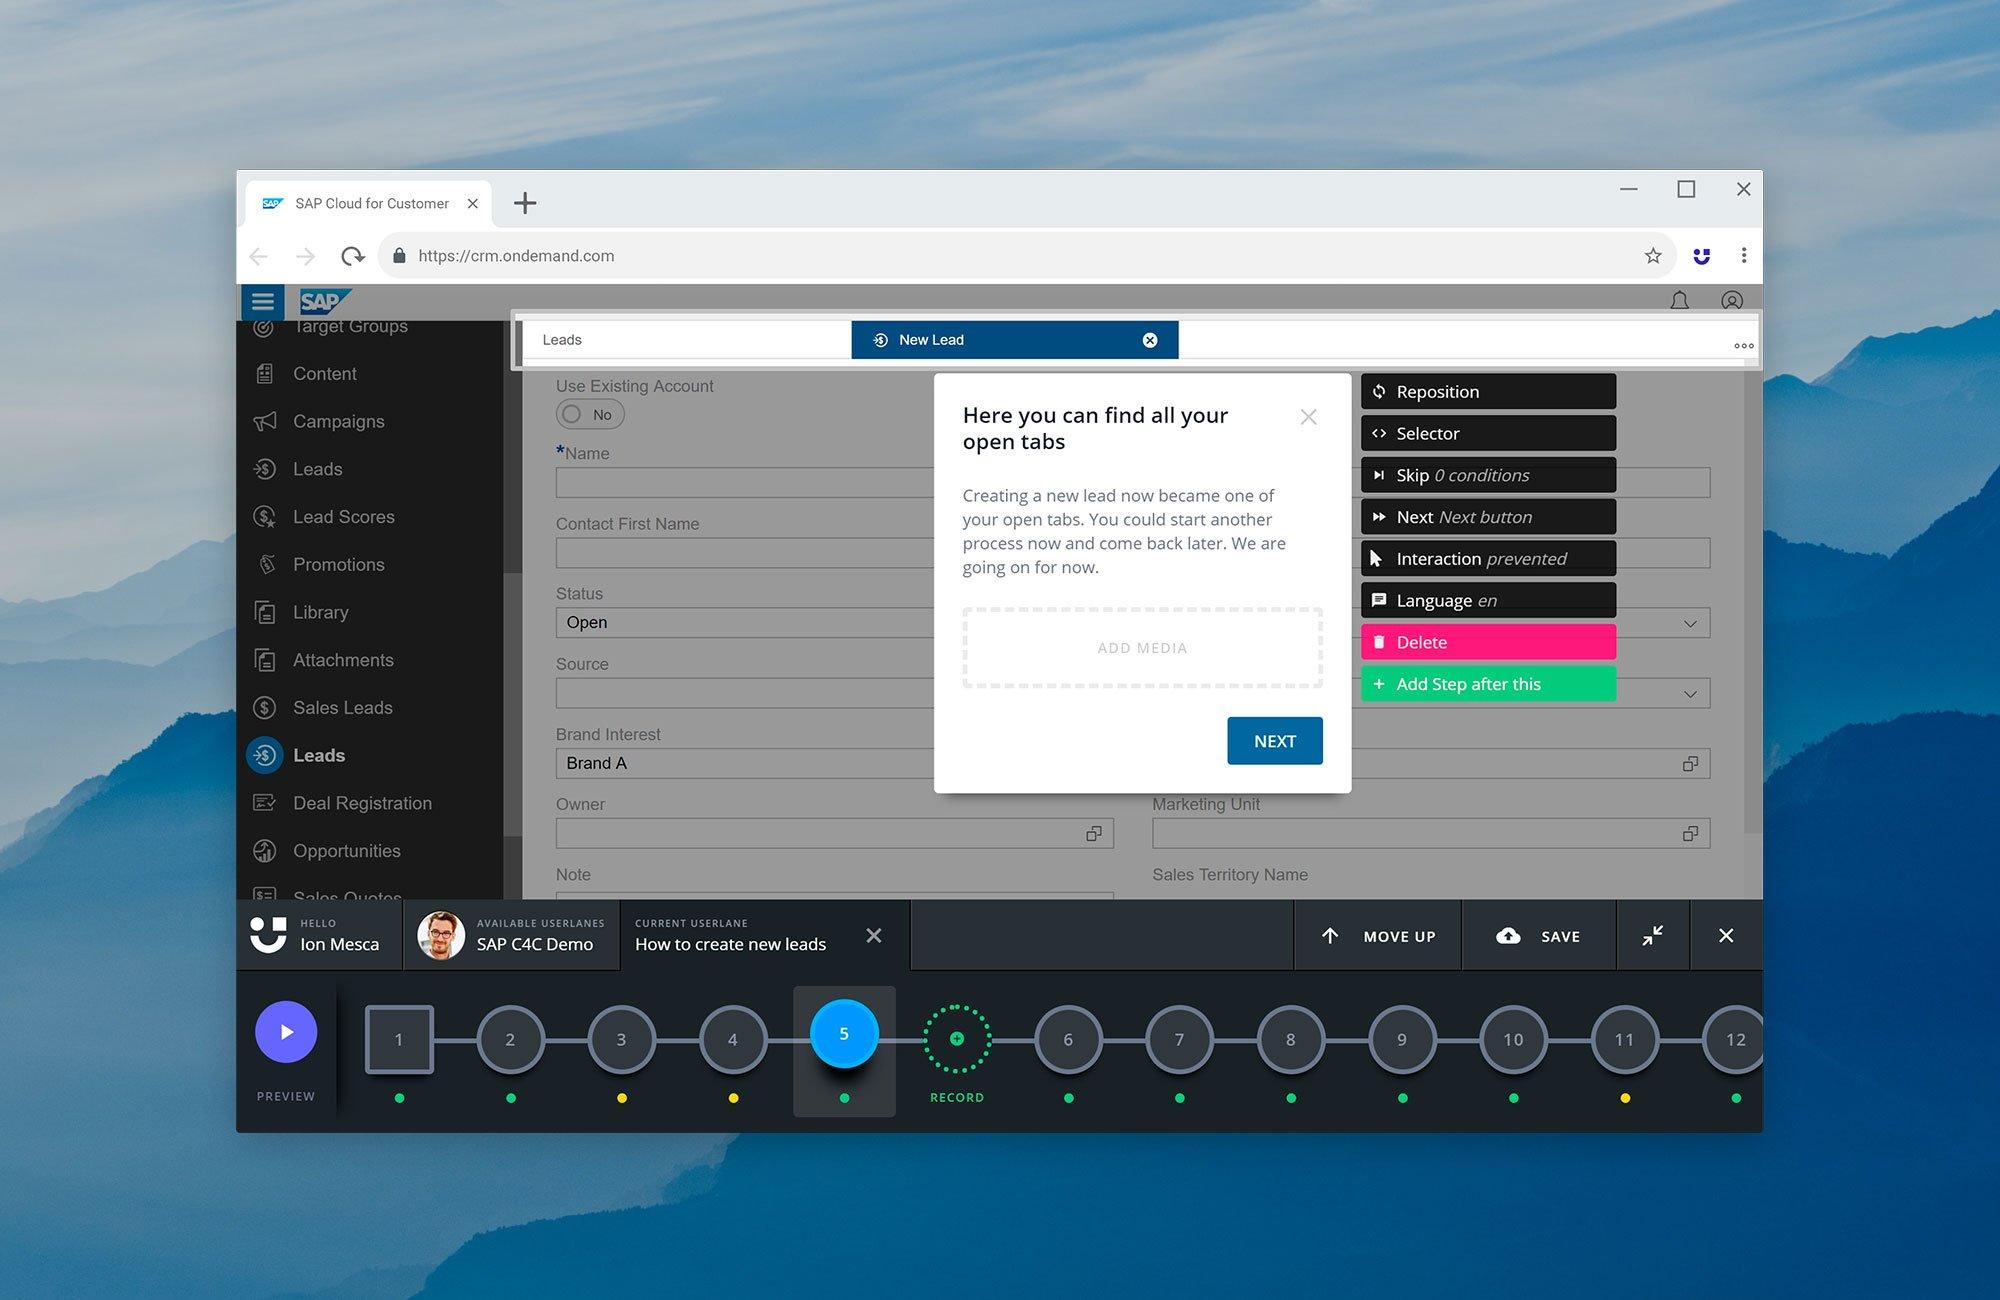 sap_screenshot_editor2_windows_2000x1300